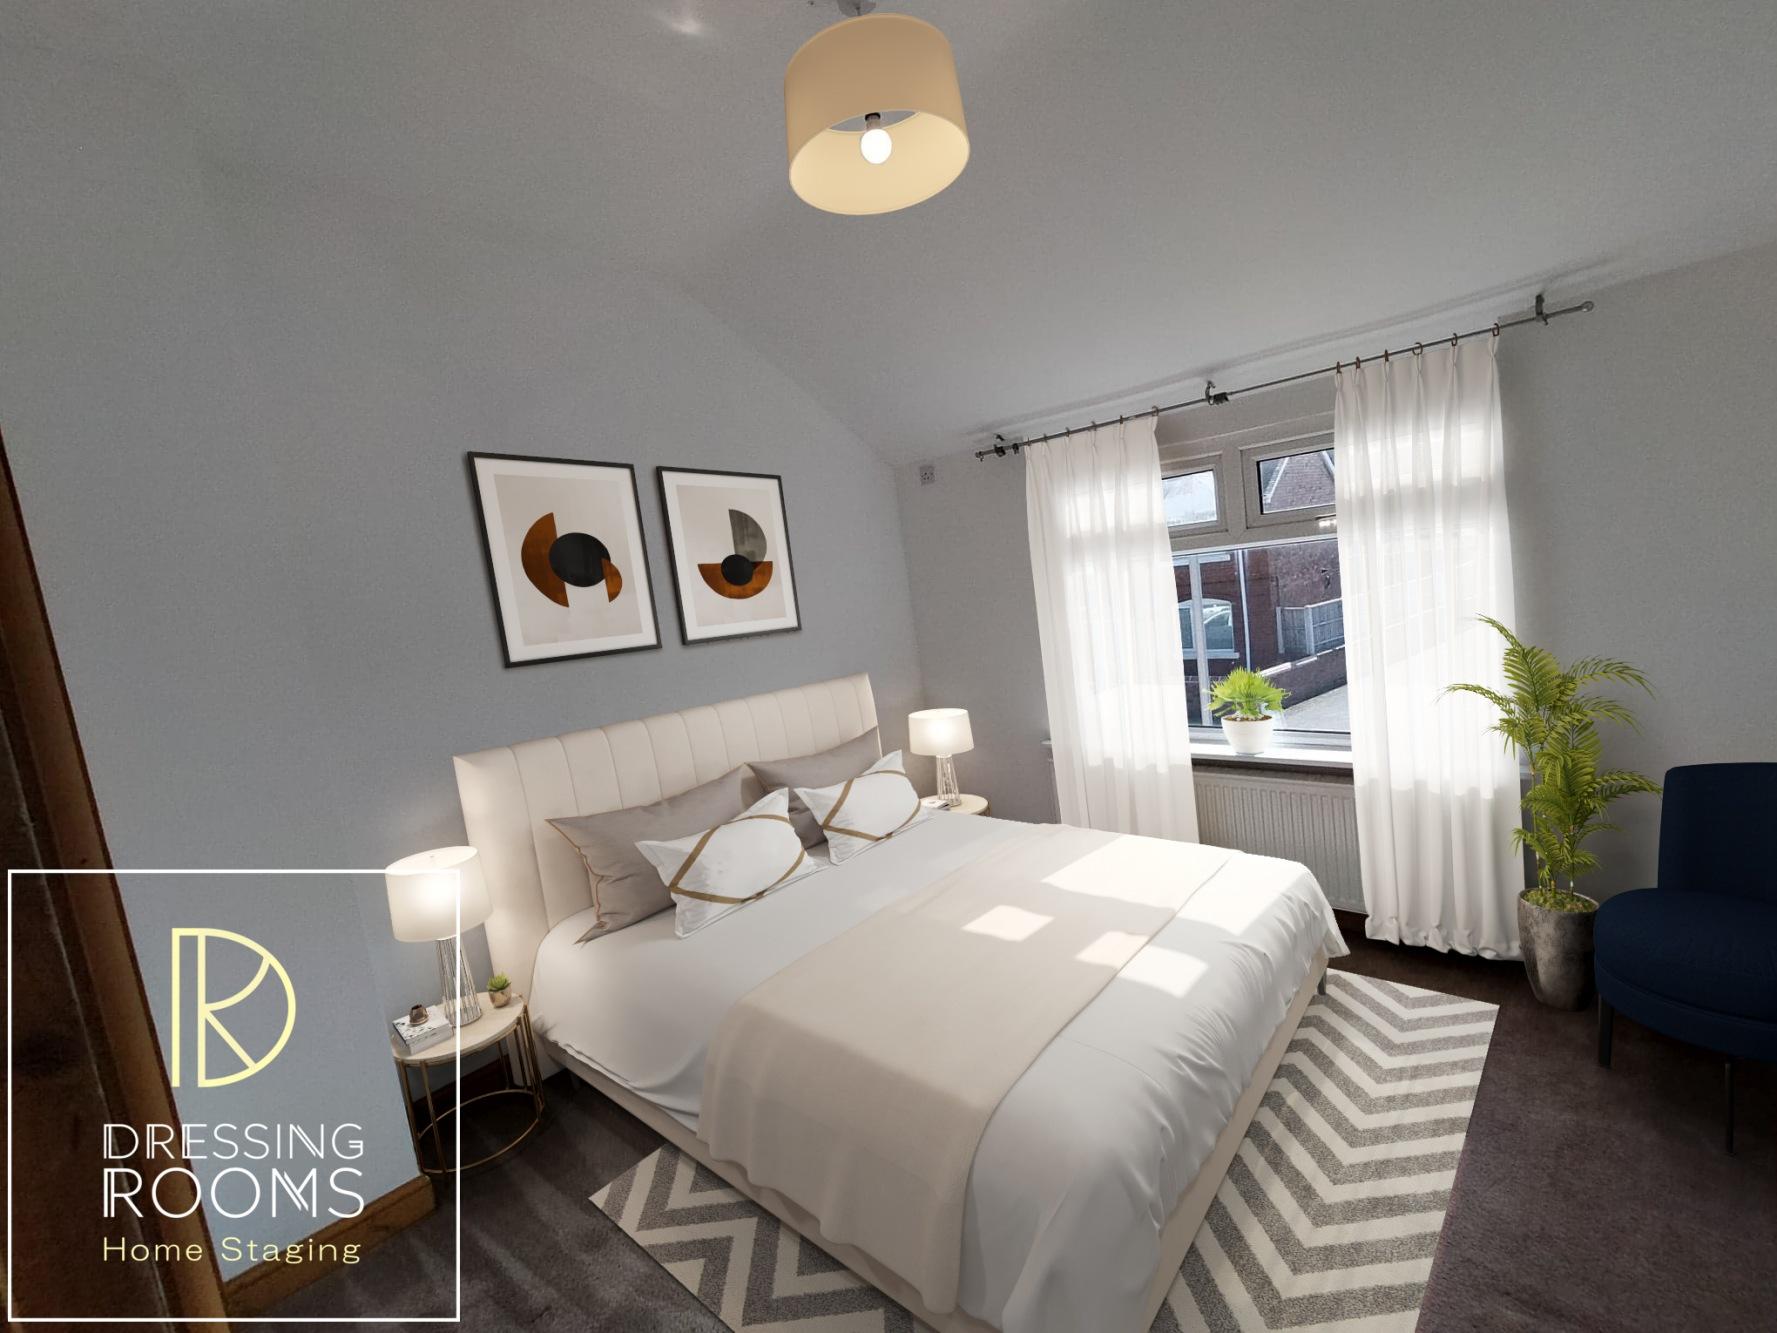 Bedroom-1_final-copy-2-WM-Copy